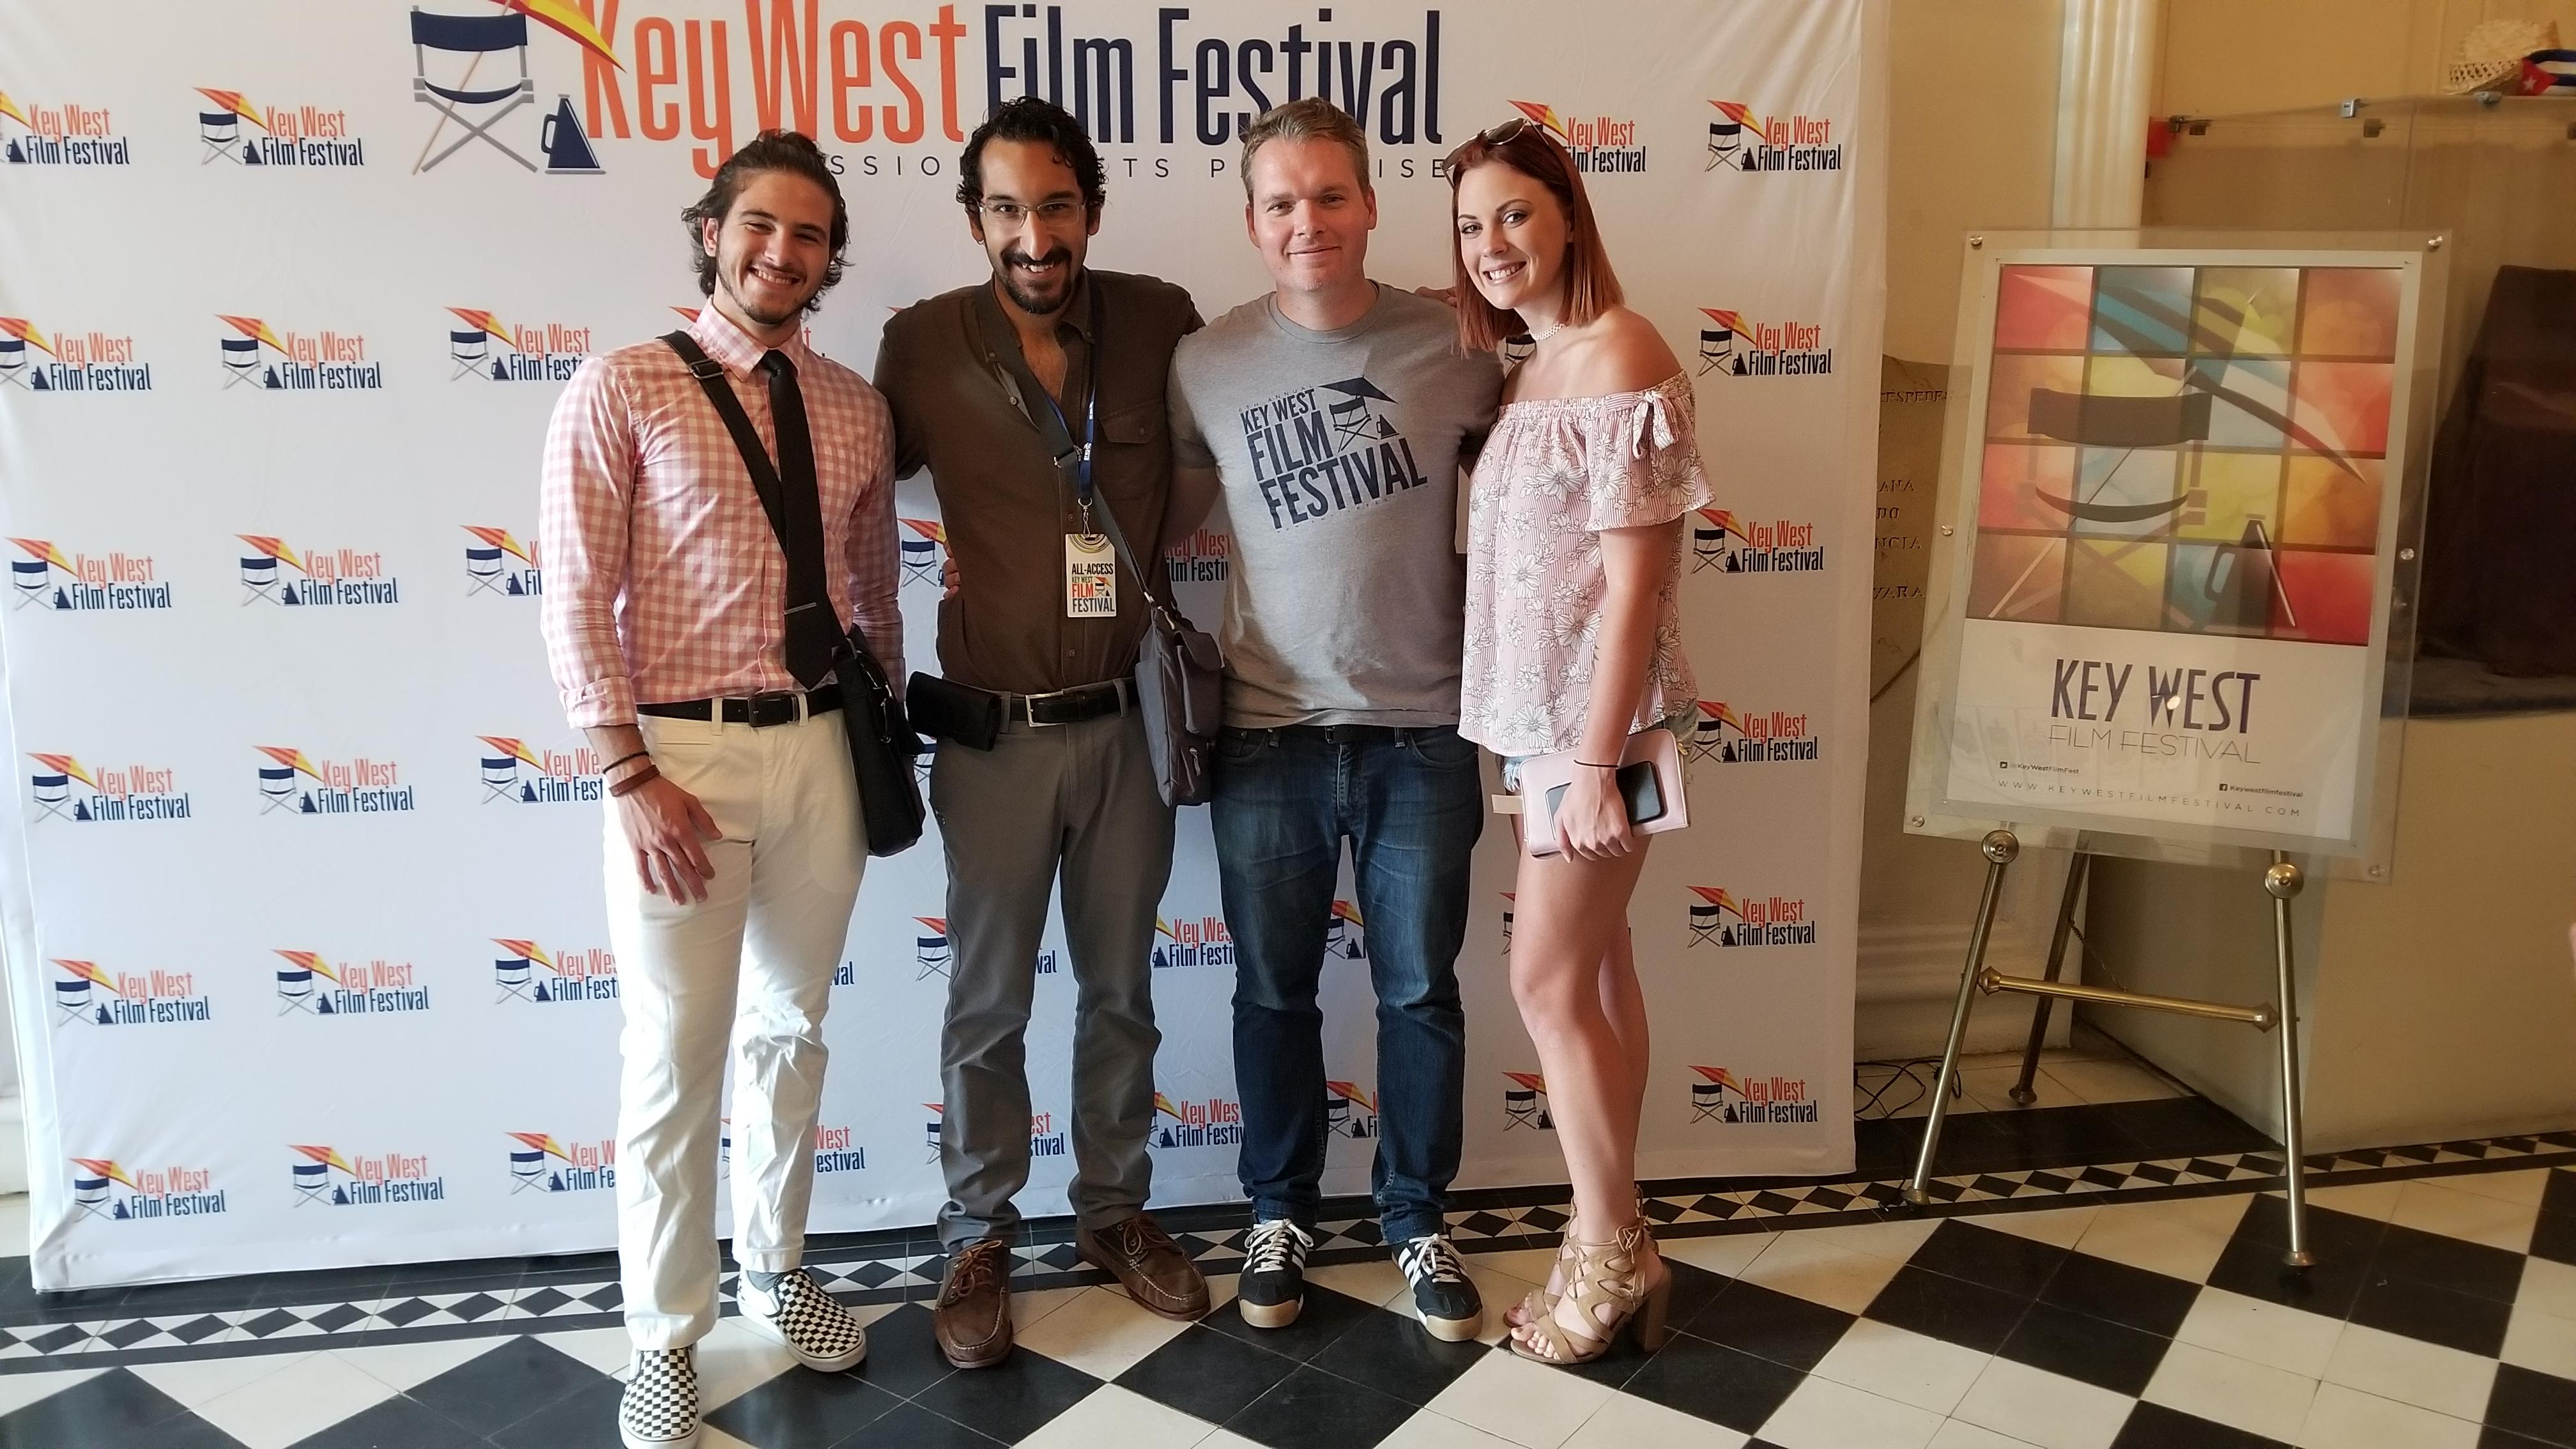 At Key West Film Festival 2017!